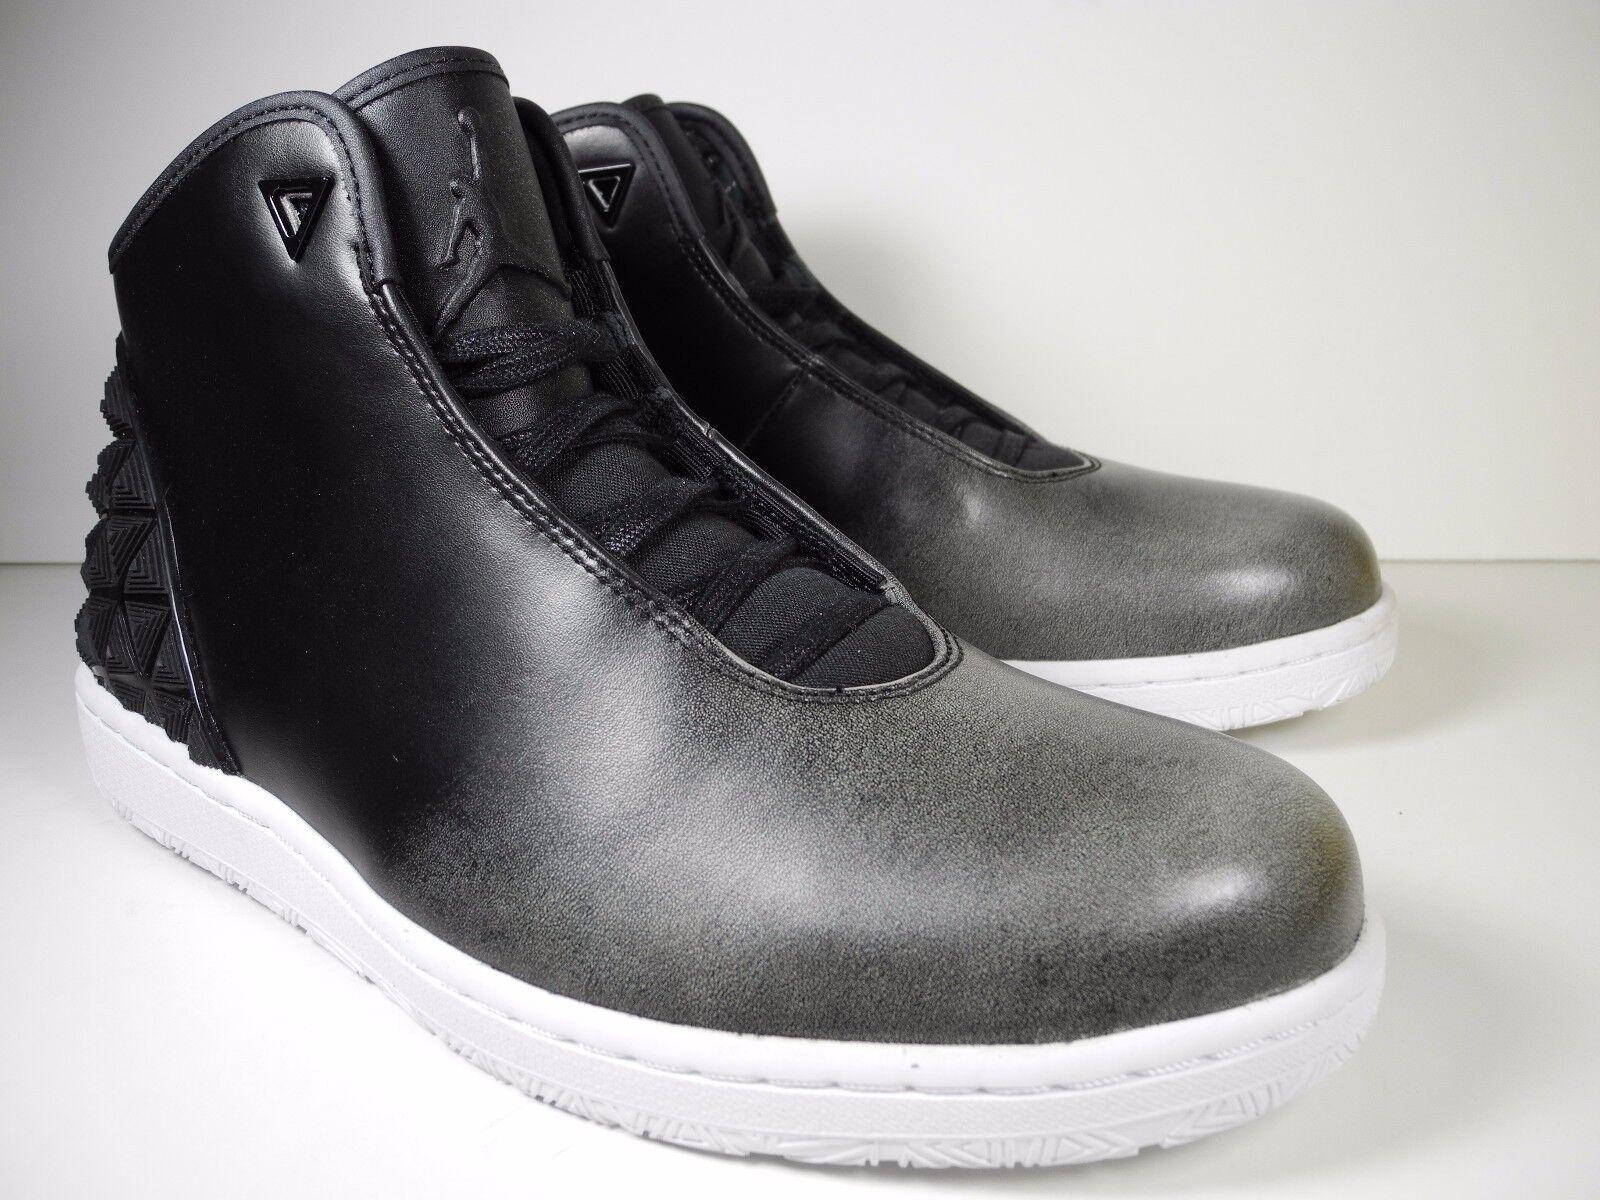 Nike Jordan Instigador Hombres Calzado Calzado Calzado Deportivo Talla Us 10 Ebay 7d4f80